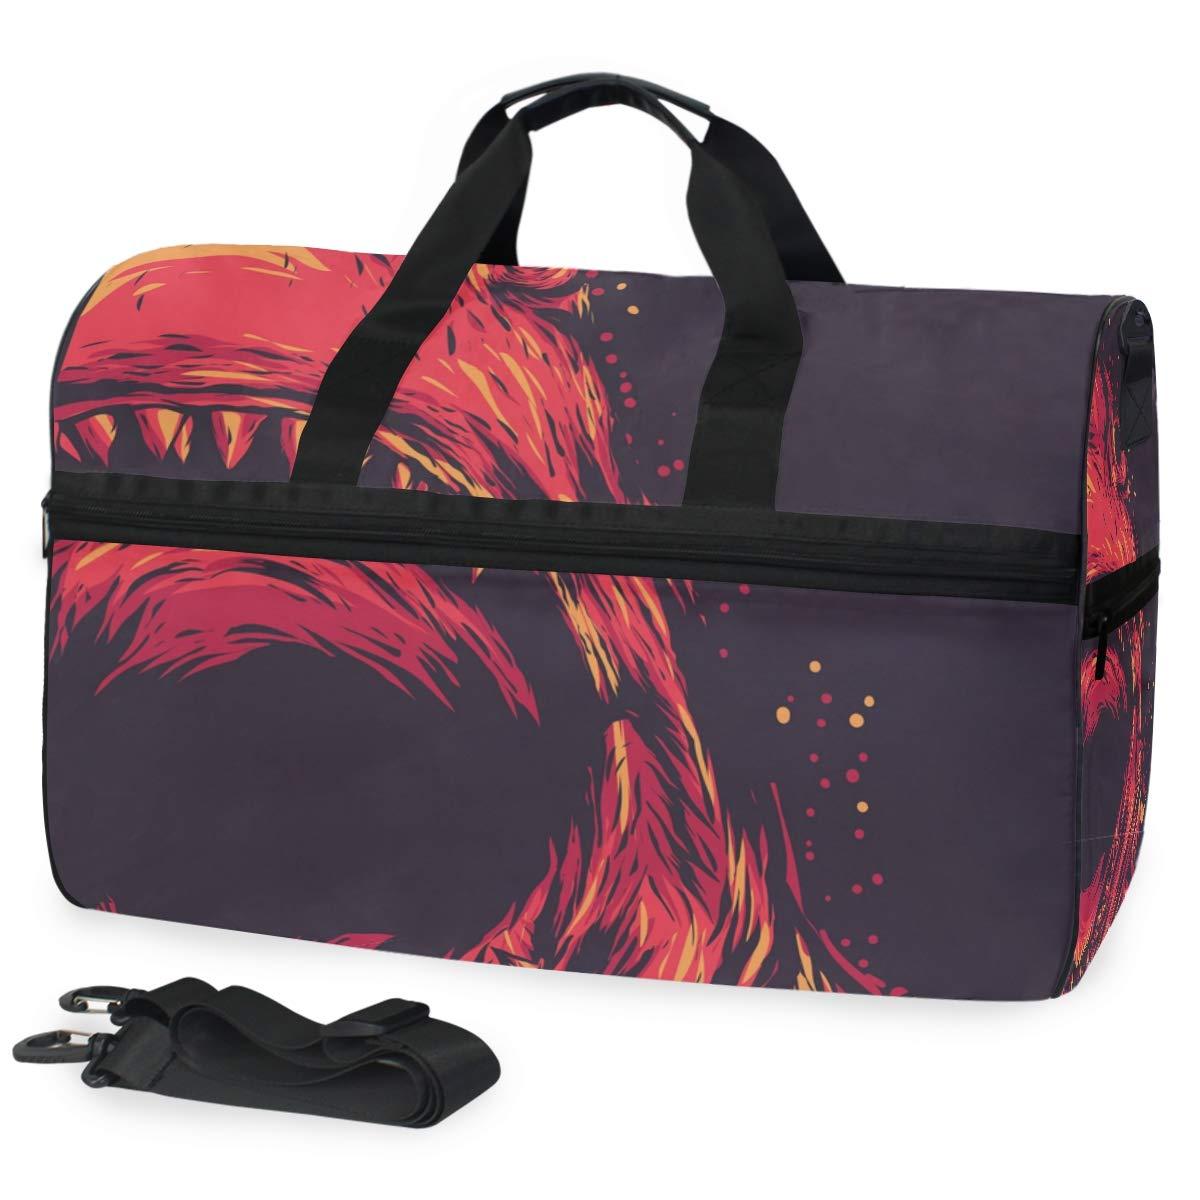 Vacation Travel Duffel Bag Shark Wild Animals Waterproof Lightweight Luggage bag for Sports Gym